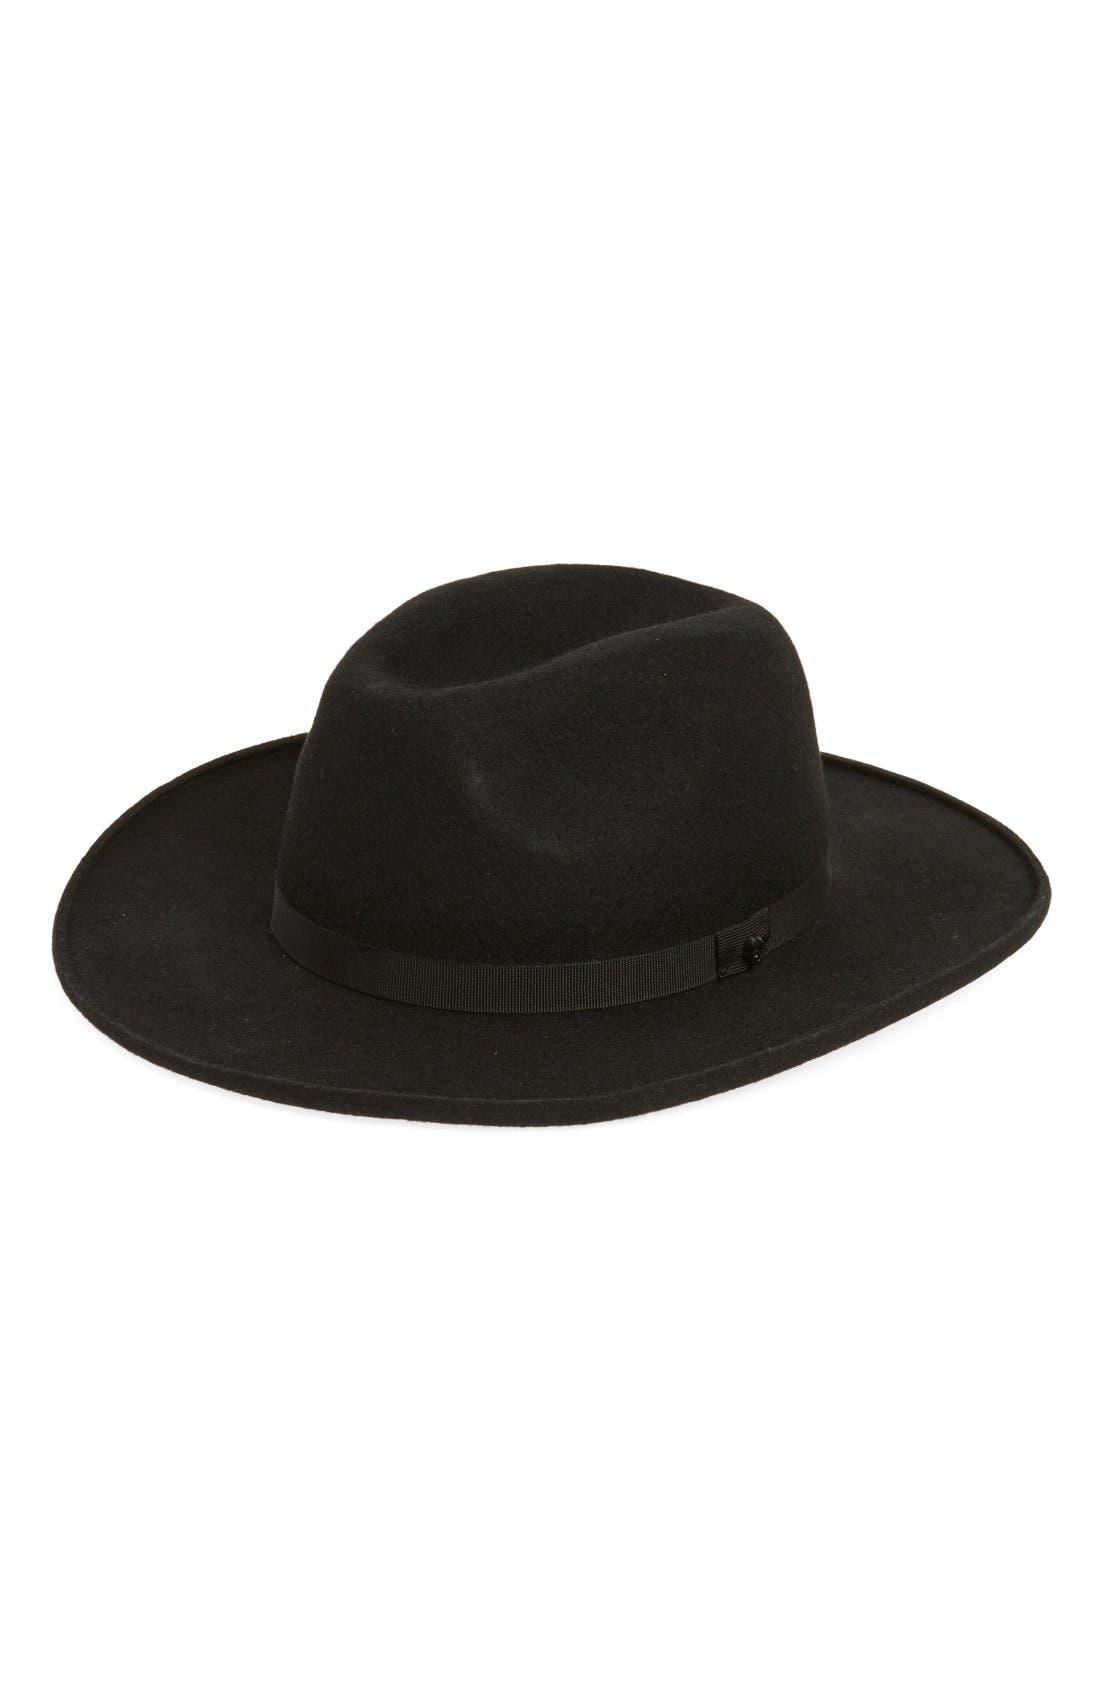 Wool Felt Hat,                         Main,                         color, Black